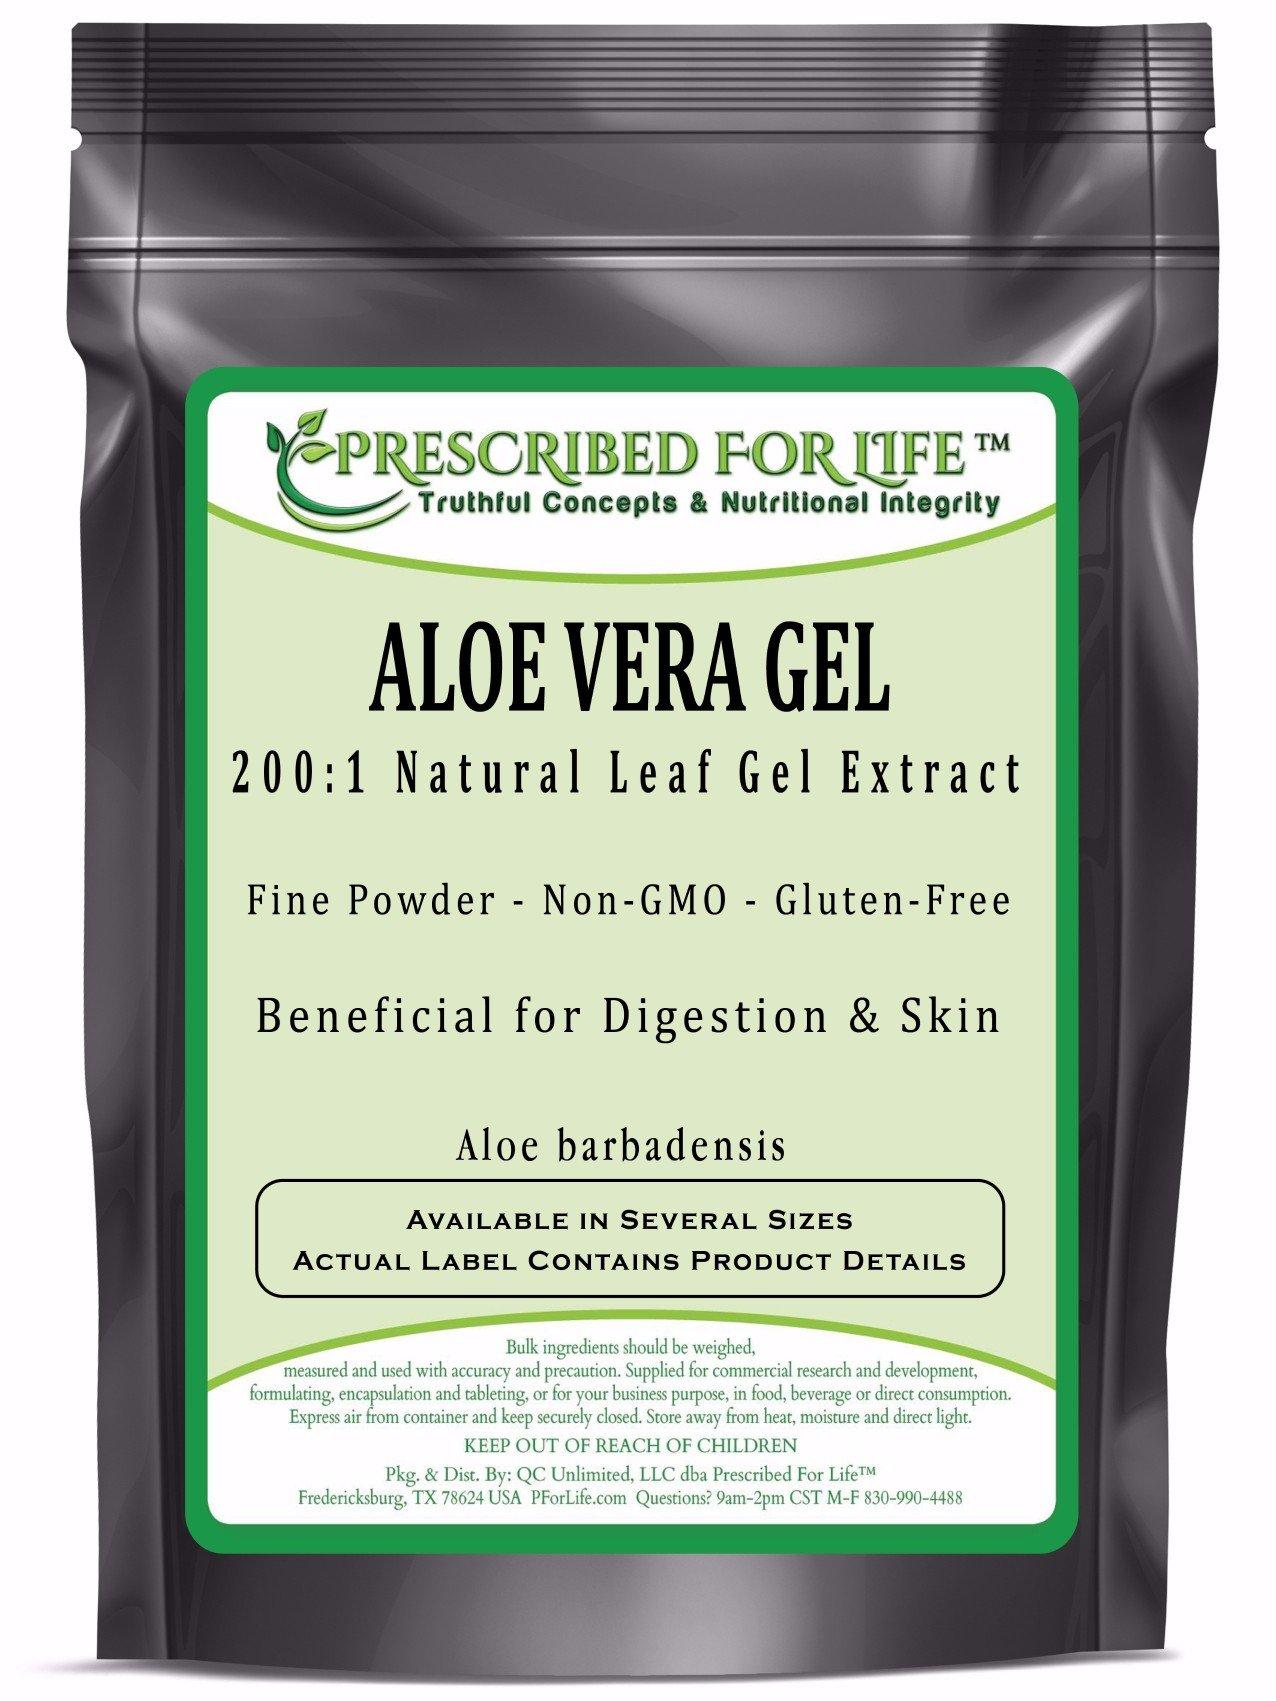 Aloe Vera - 200:1 Natural Leaf Gel Extract Powder (Aloe barbadensis), 55 lb